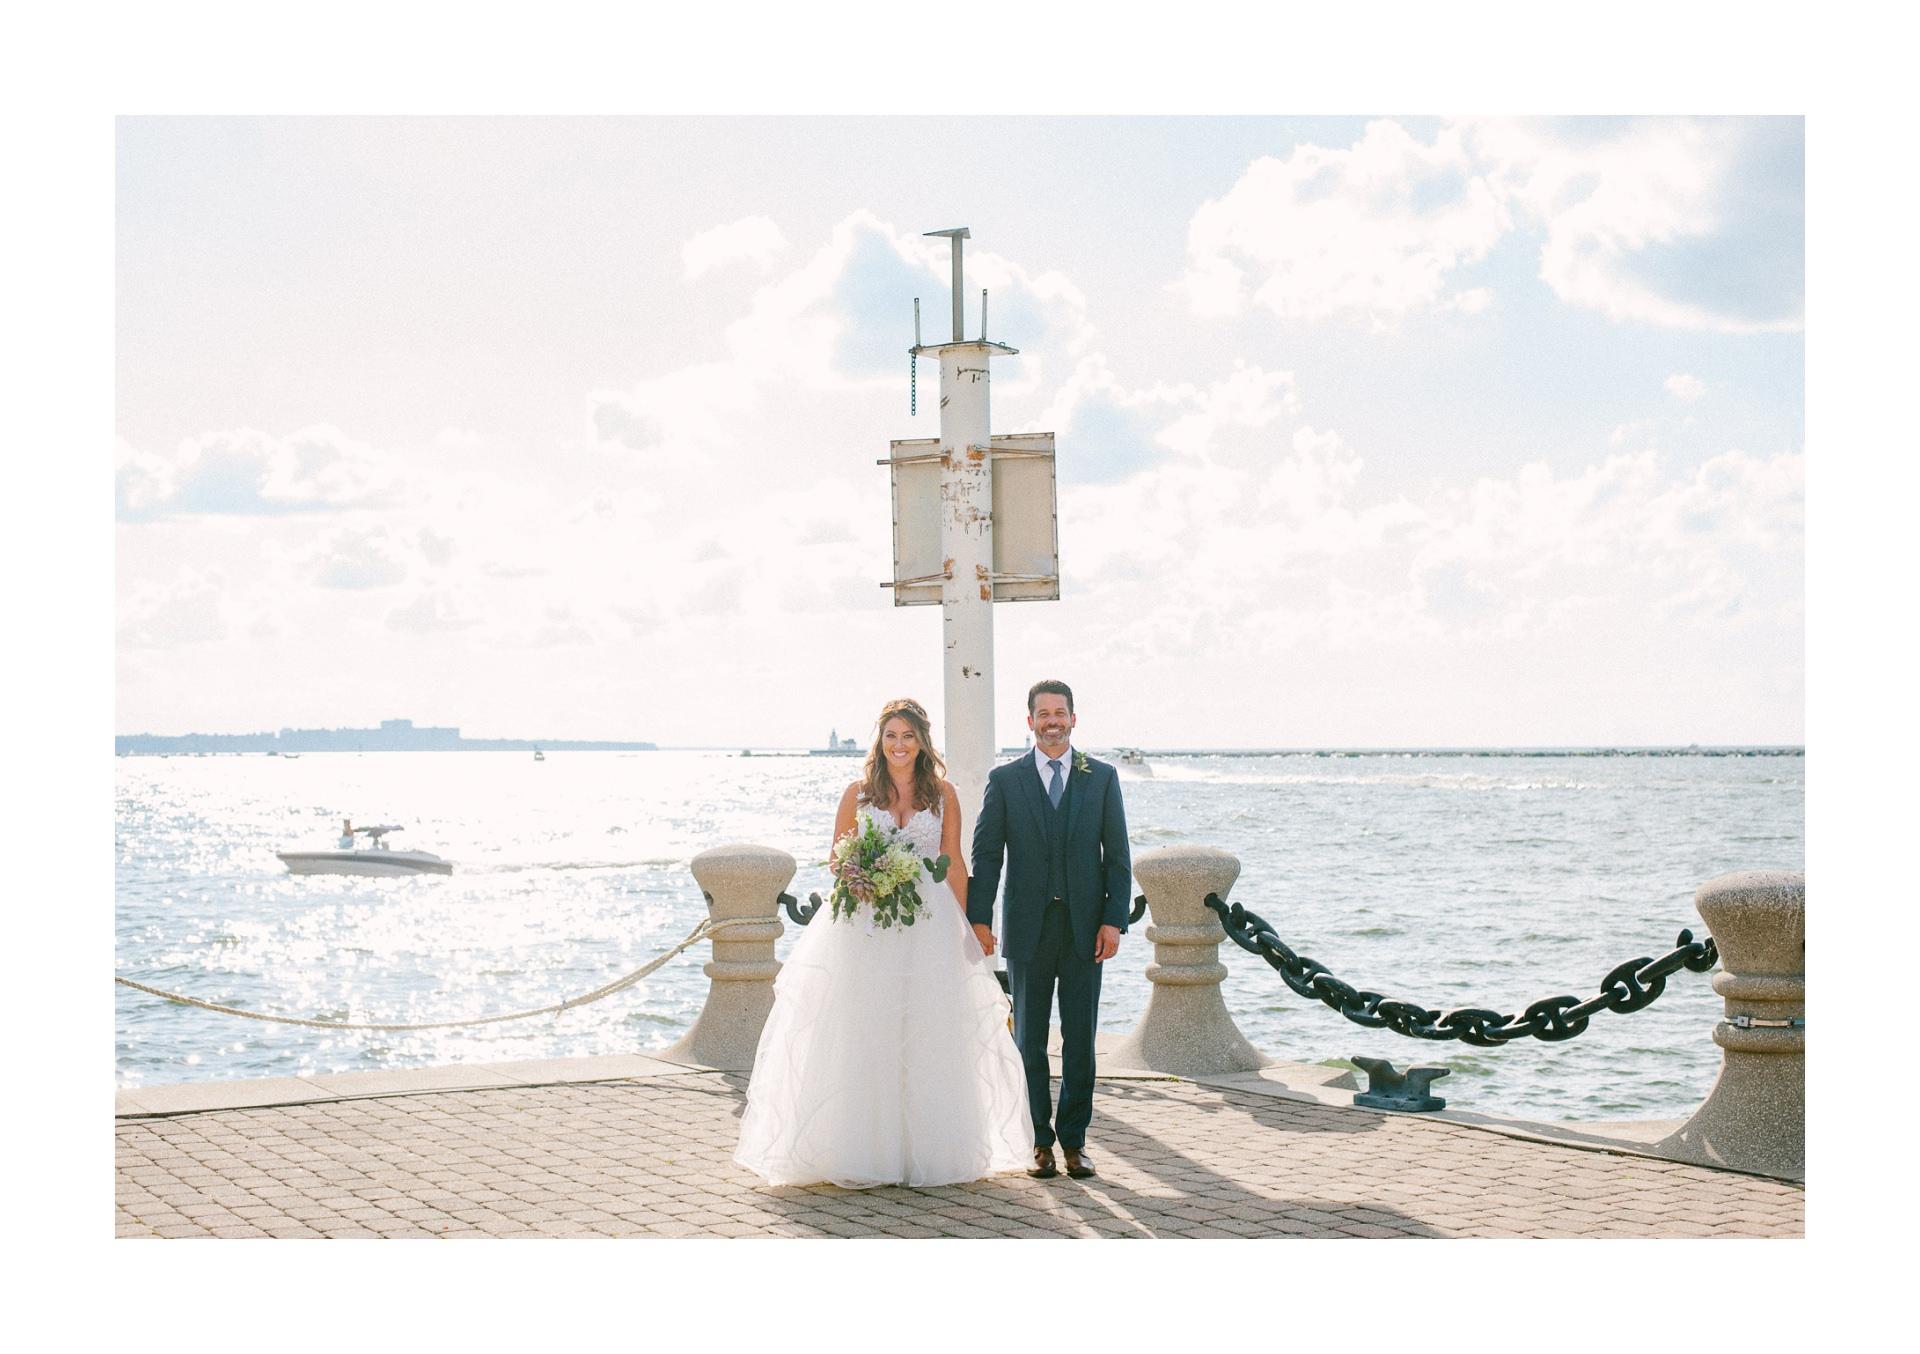 Nuevo Modern Mexican Wedding Photographer in Cleveland 1 40.jpg